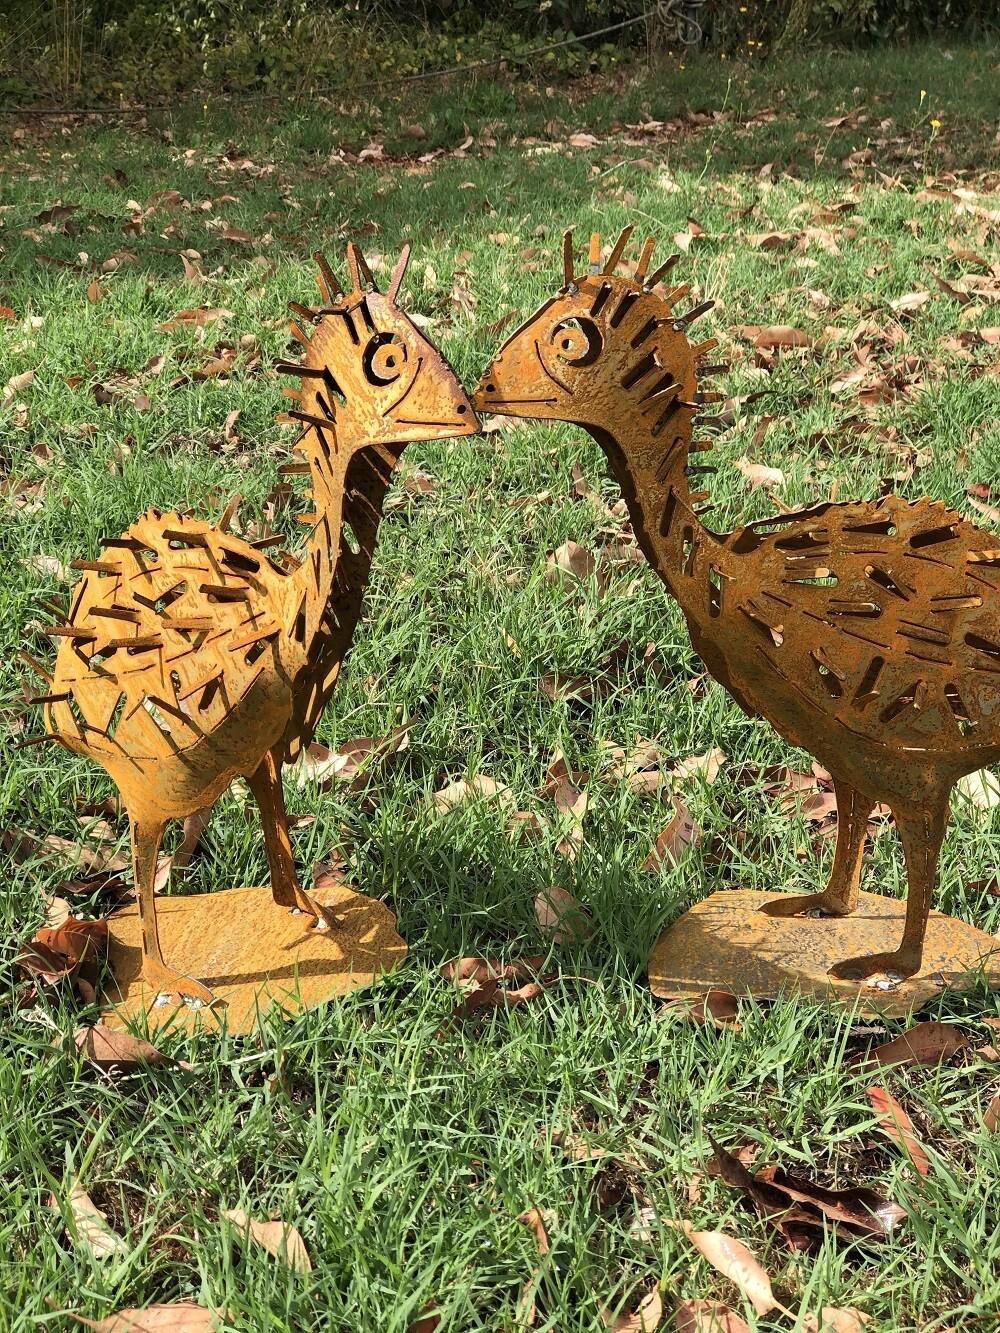 Emu Chicks